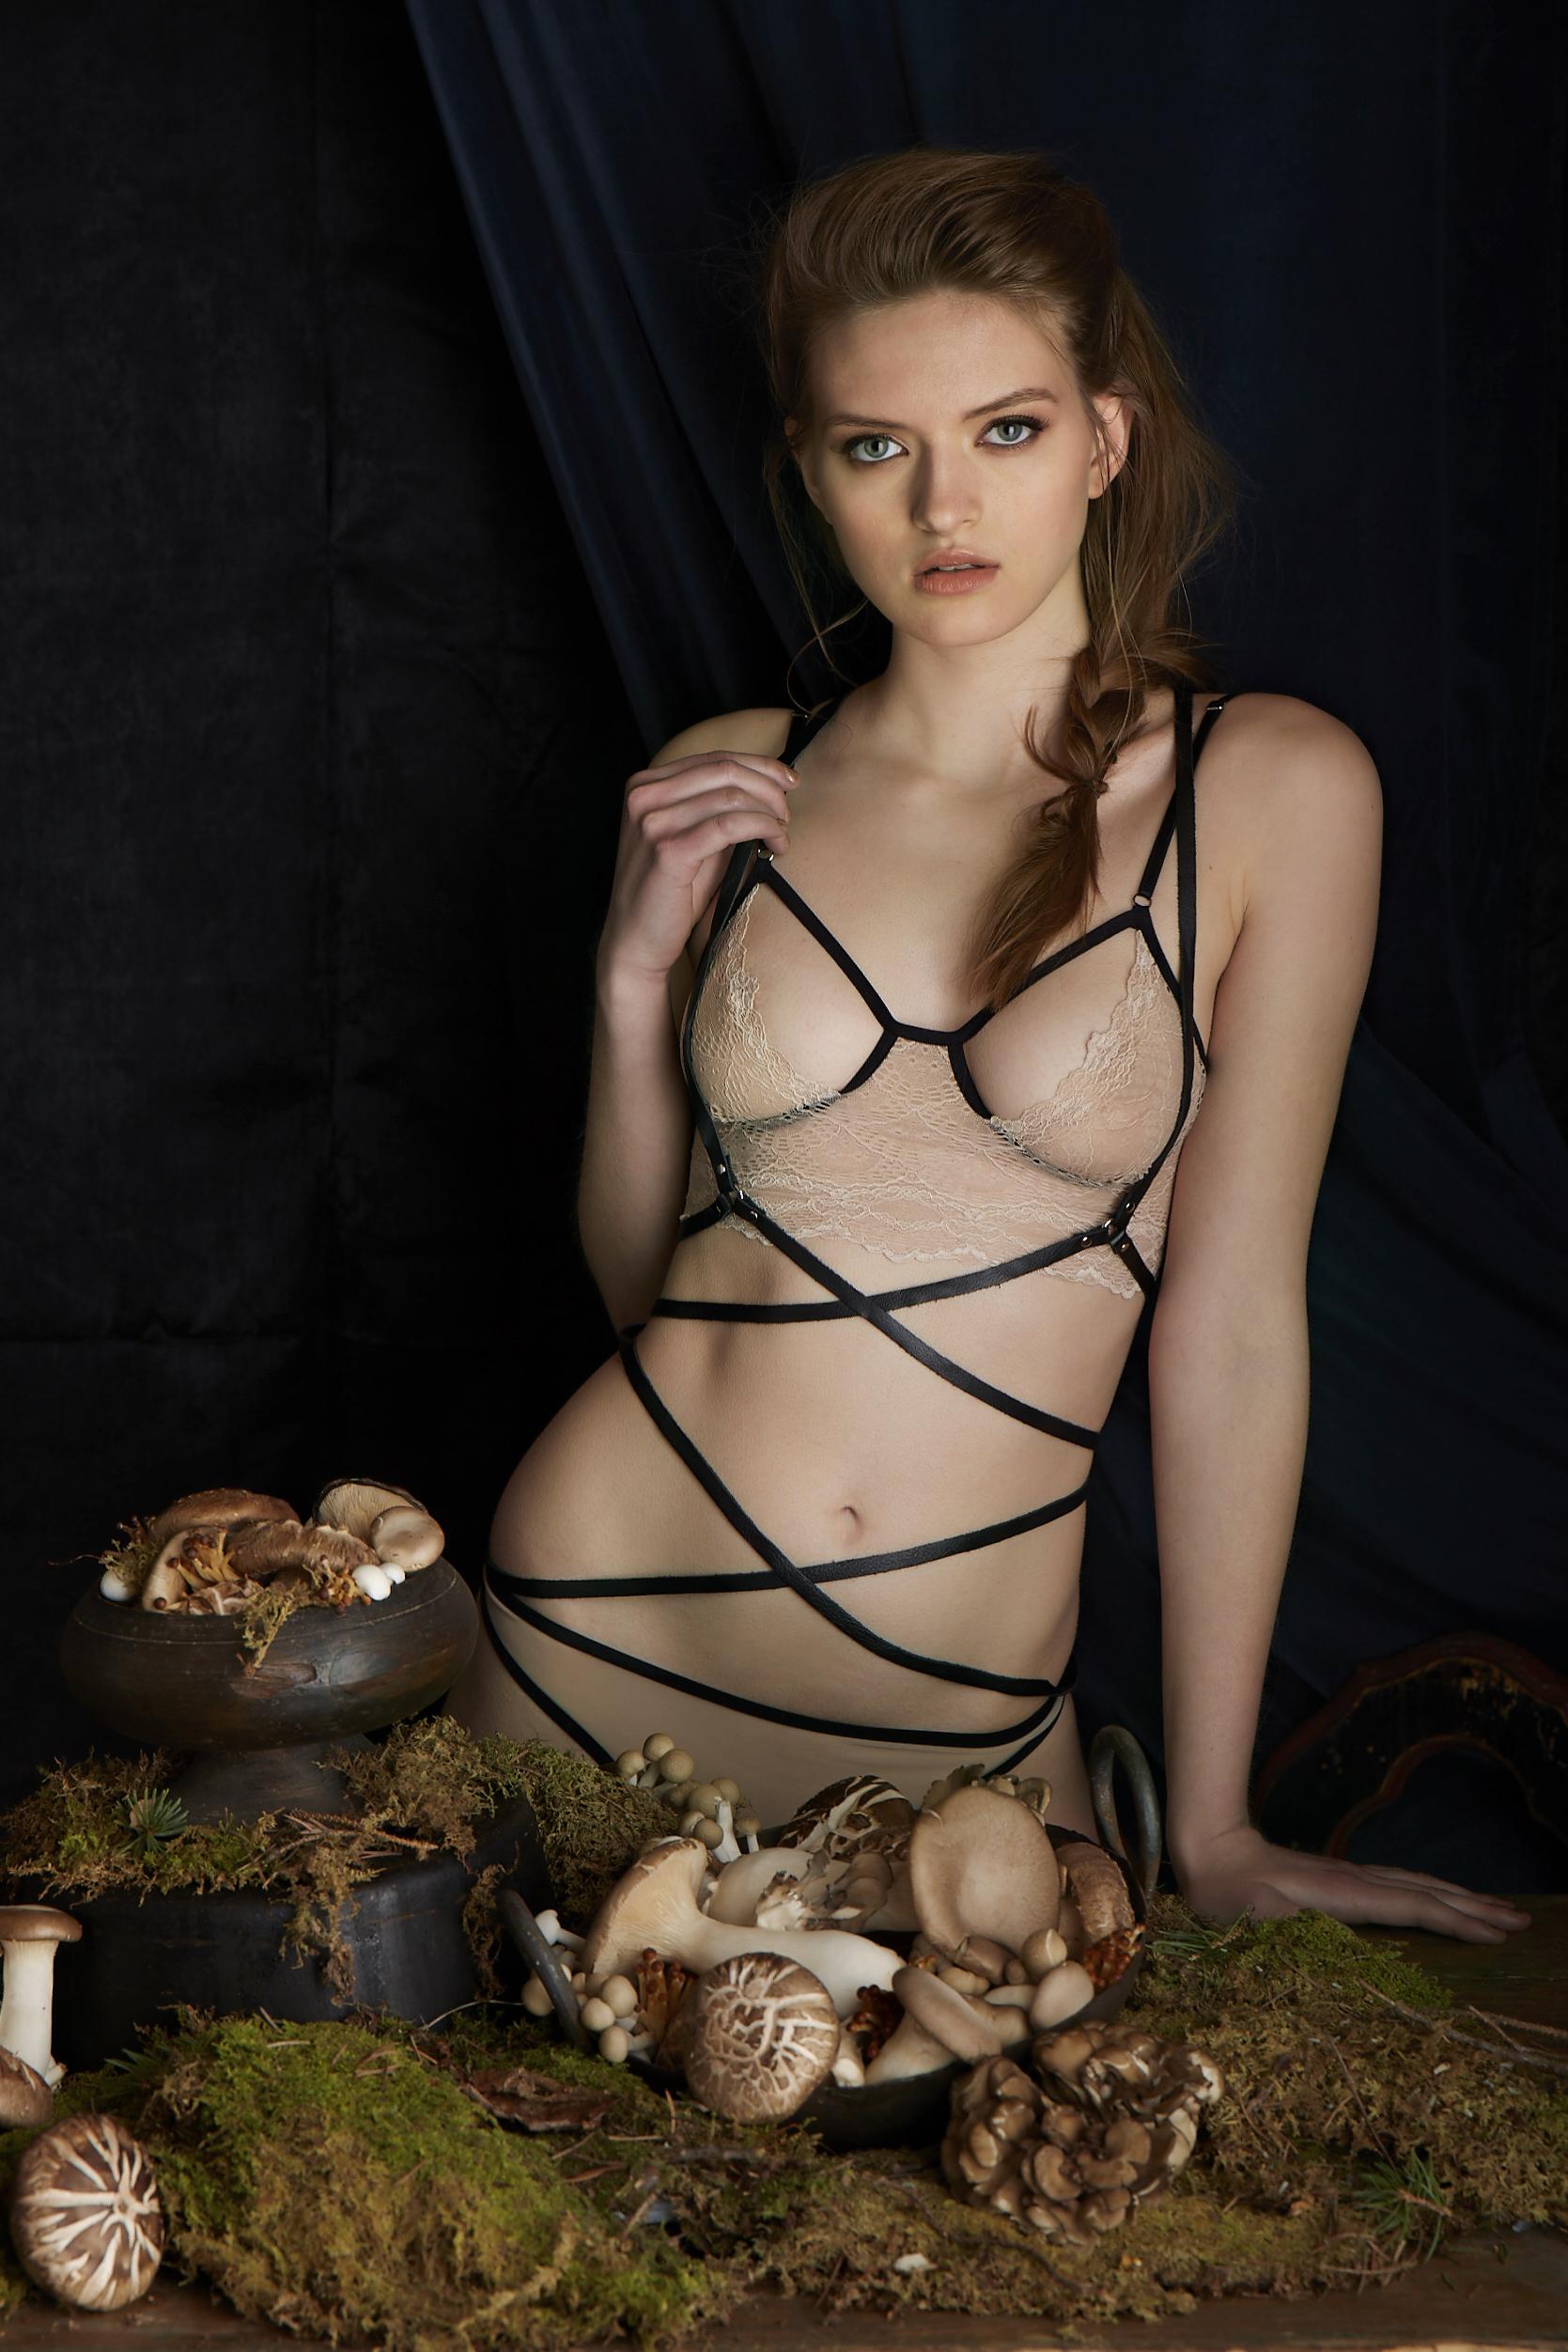 Dianna_Goddess_24368 1.jpg